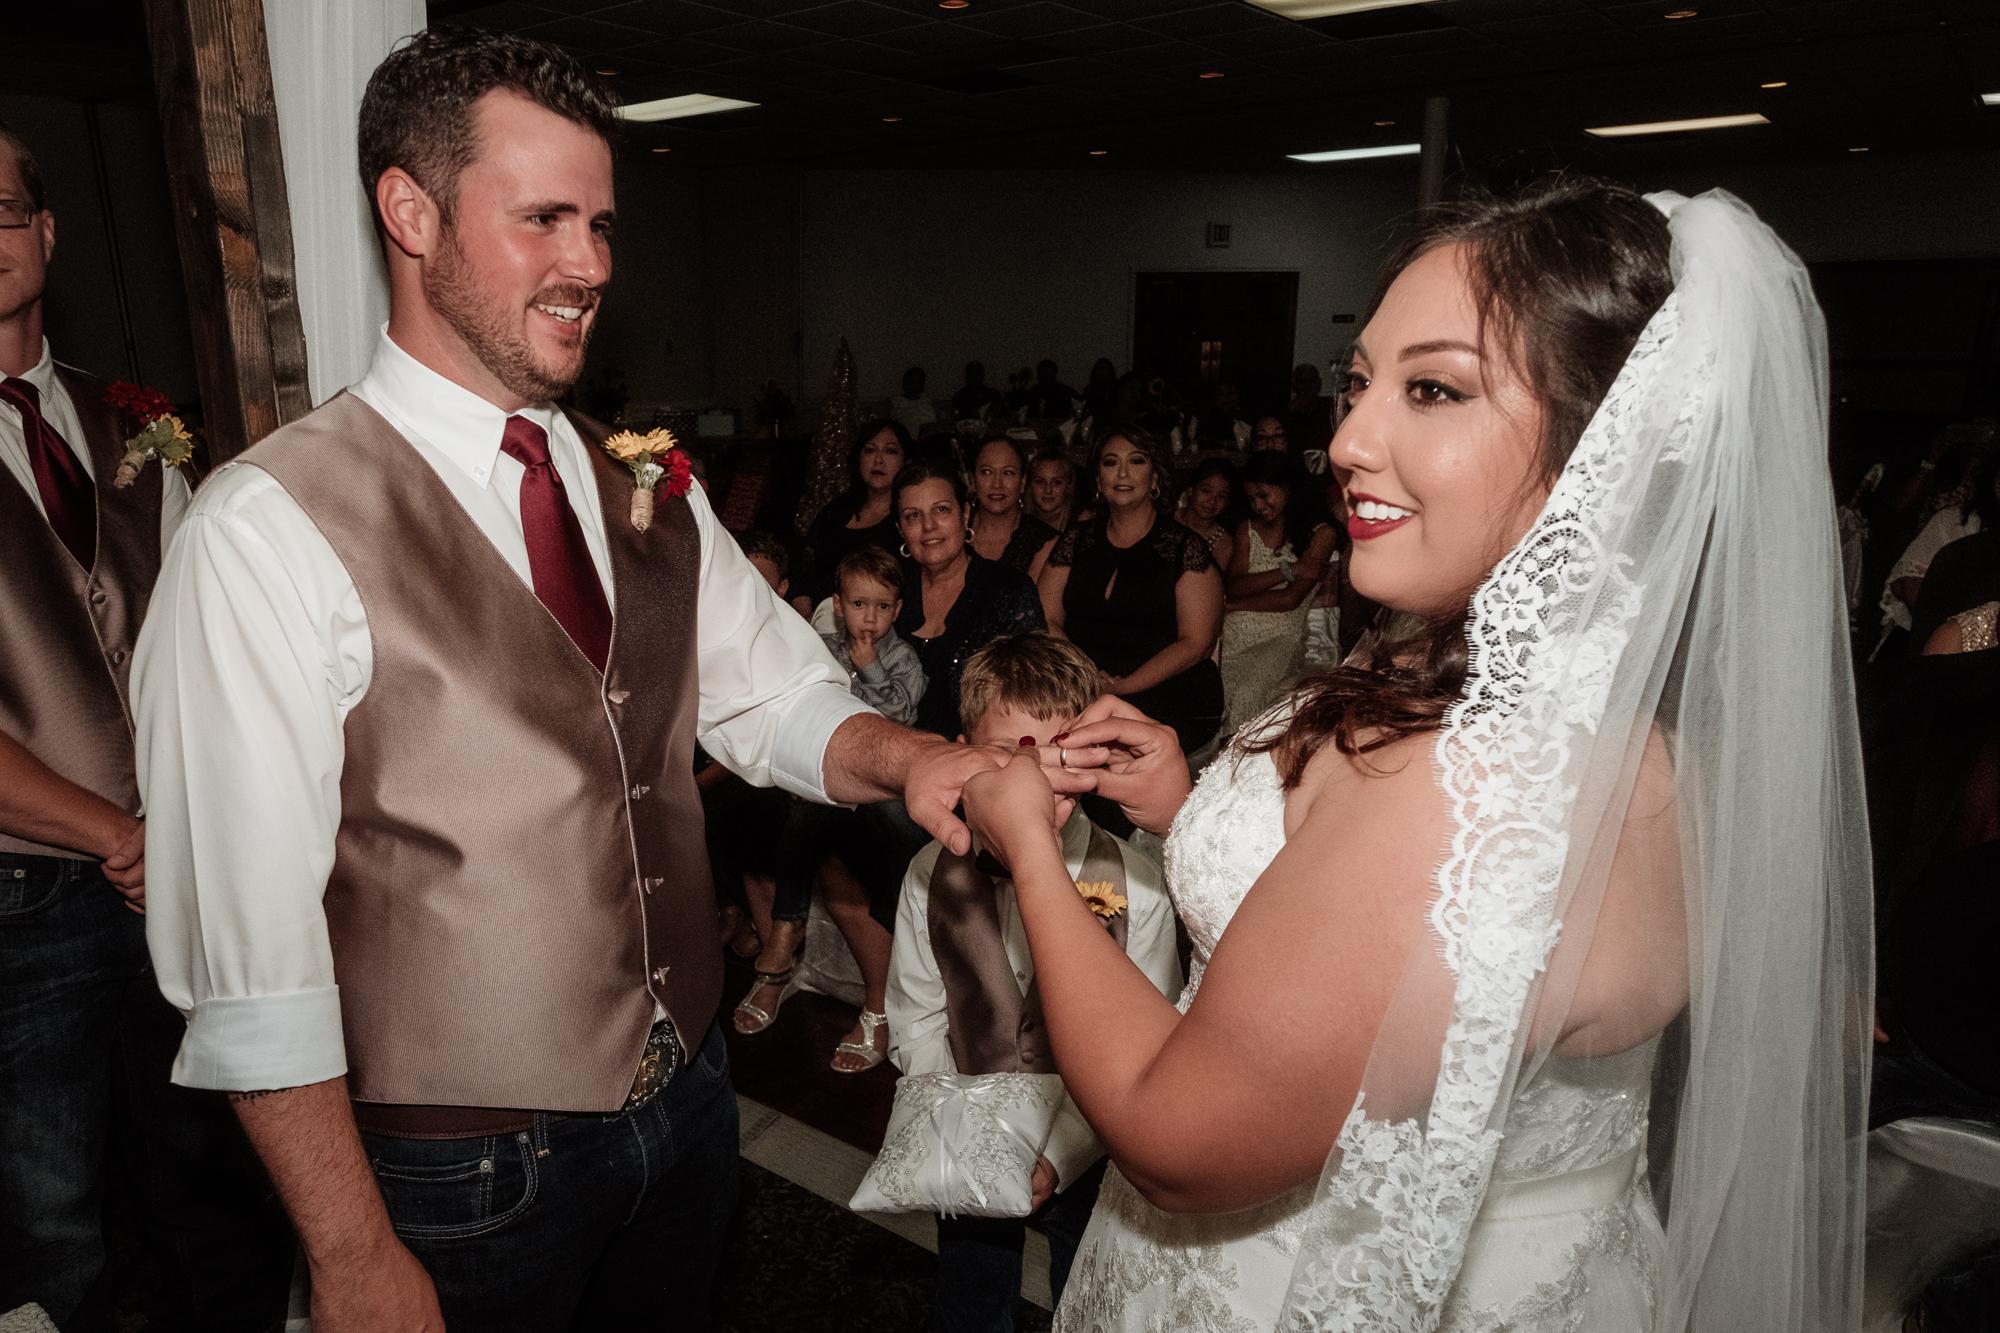 DallasAlyssa-Wedding-2019-JF-0860.jpg